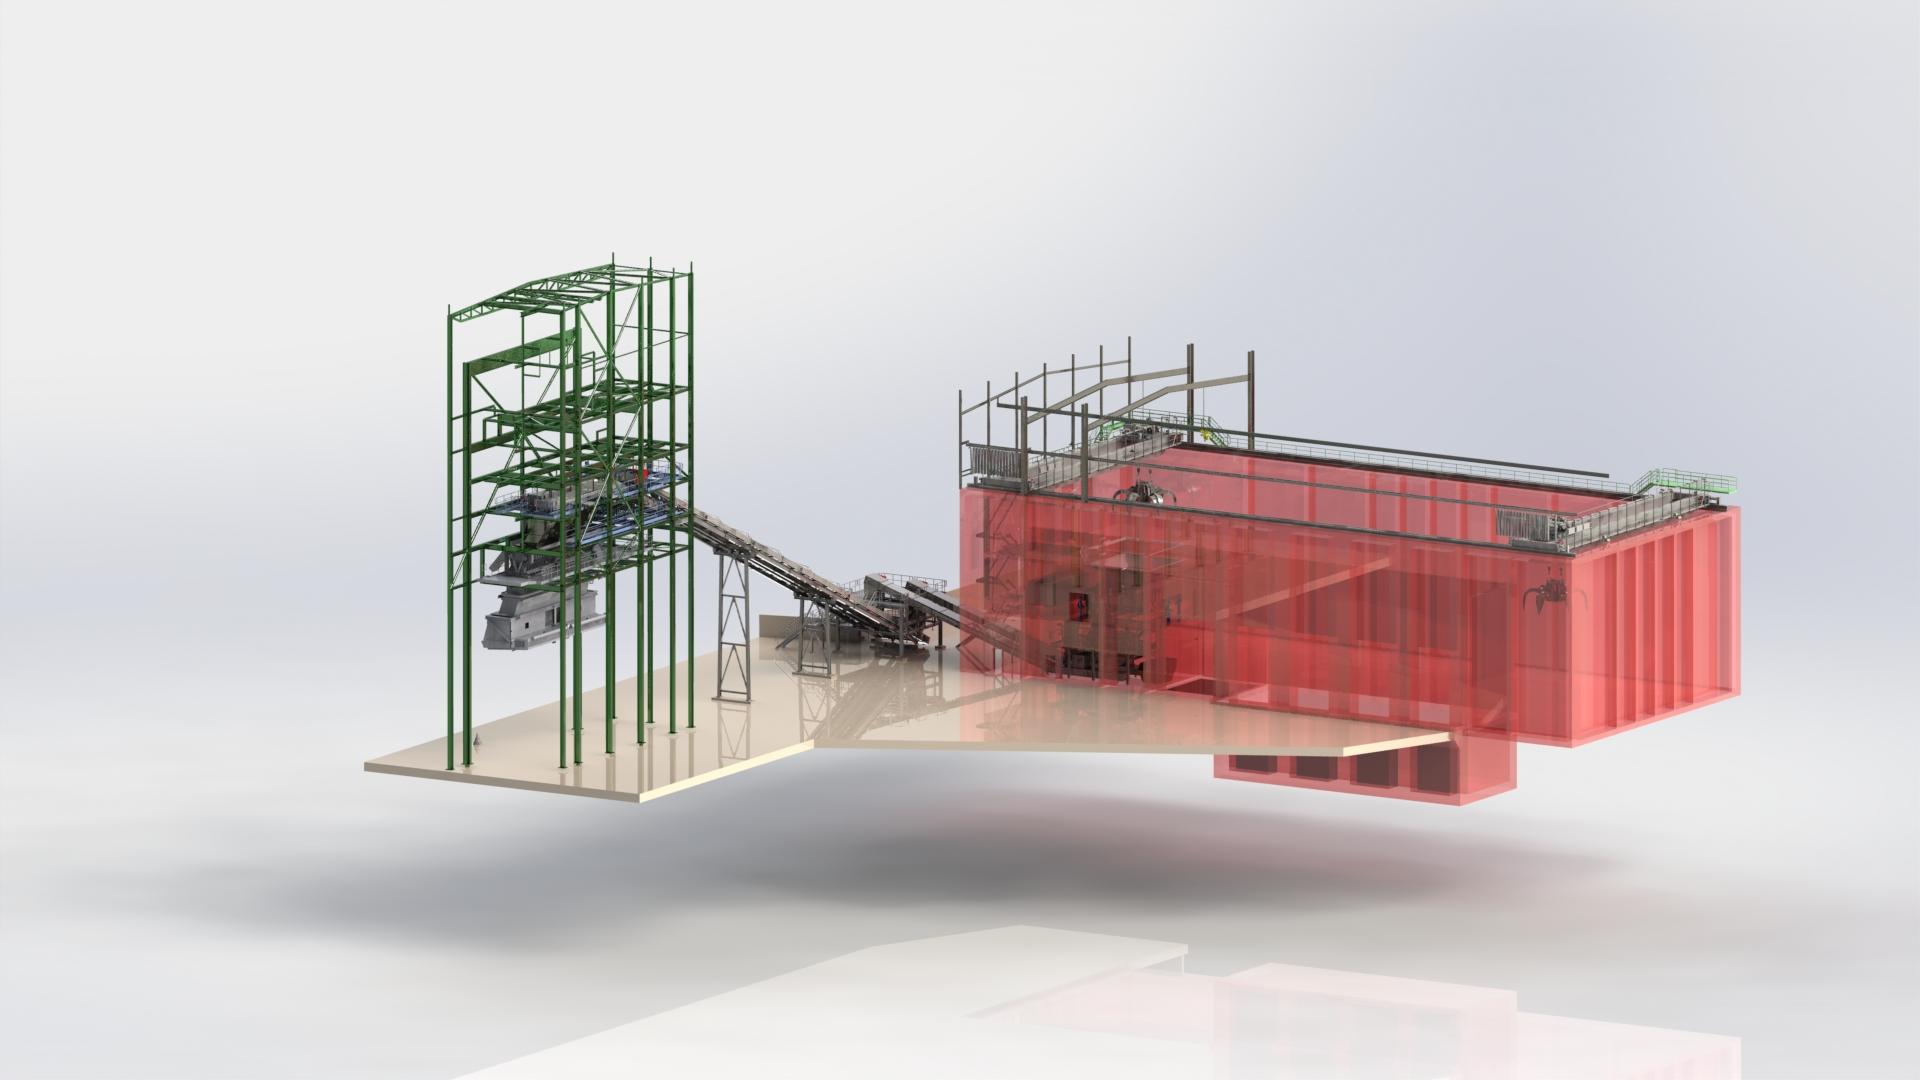 Margam, UK; Biomass Handling System